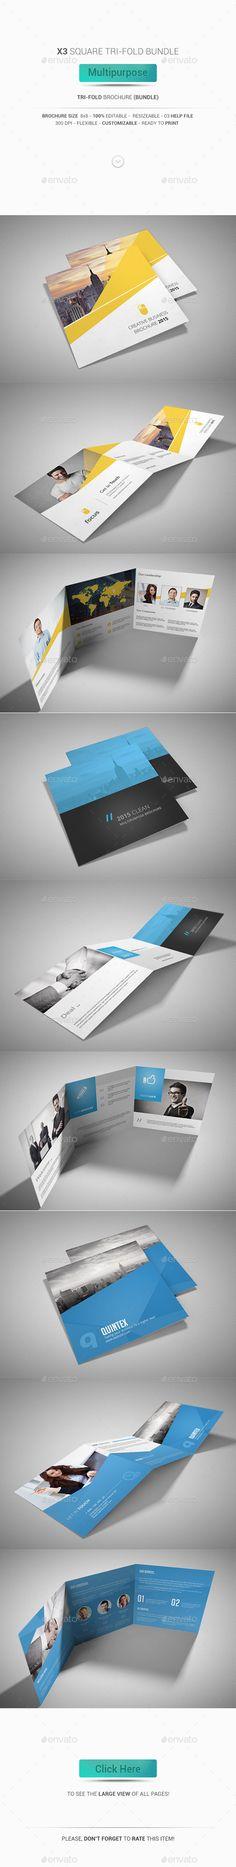 Square Tri-Fold Brochure Bundle - Multipurpose Template #design Buy Now: http://graphicriver.net/item/square-trifold-brochure-bundle-multipurpose/12860616?ref=ksioks